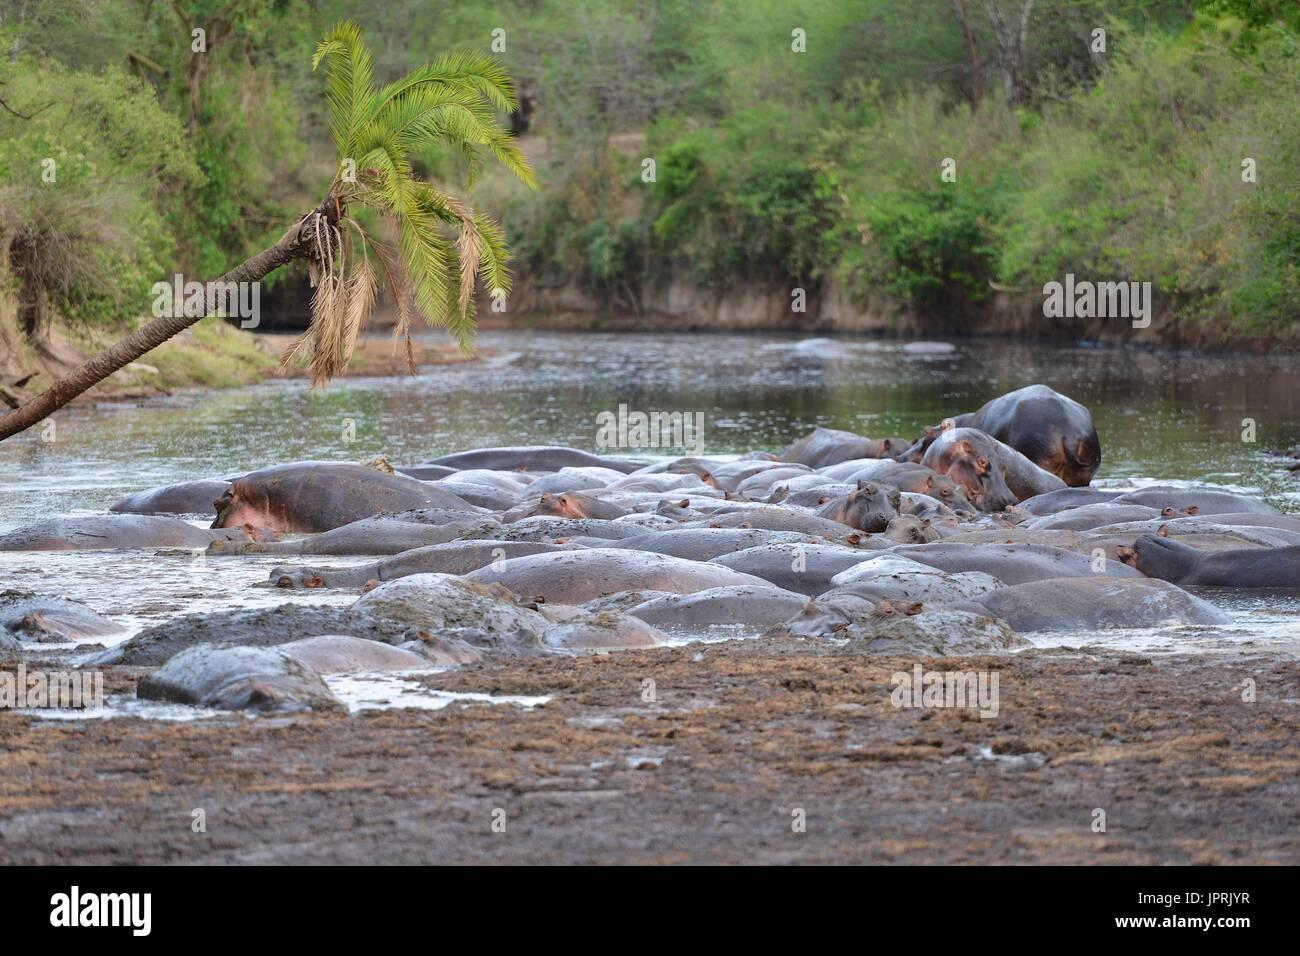 African Safari - Stock Image